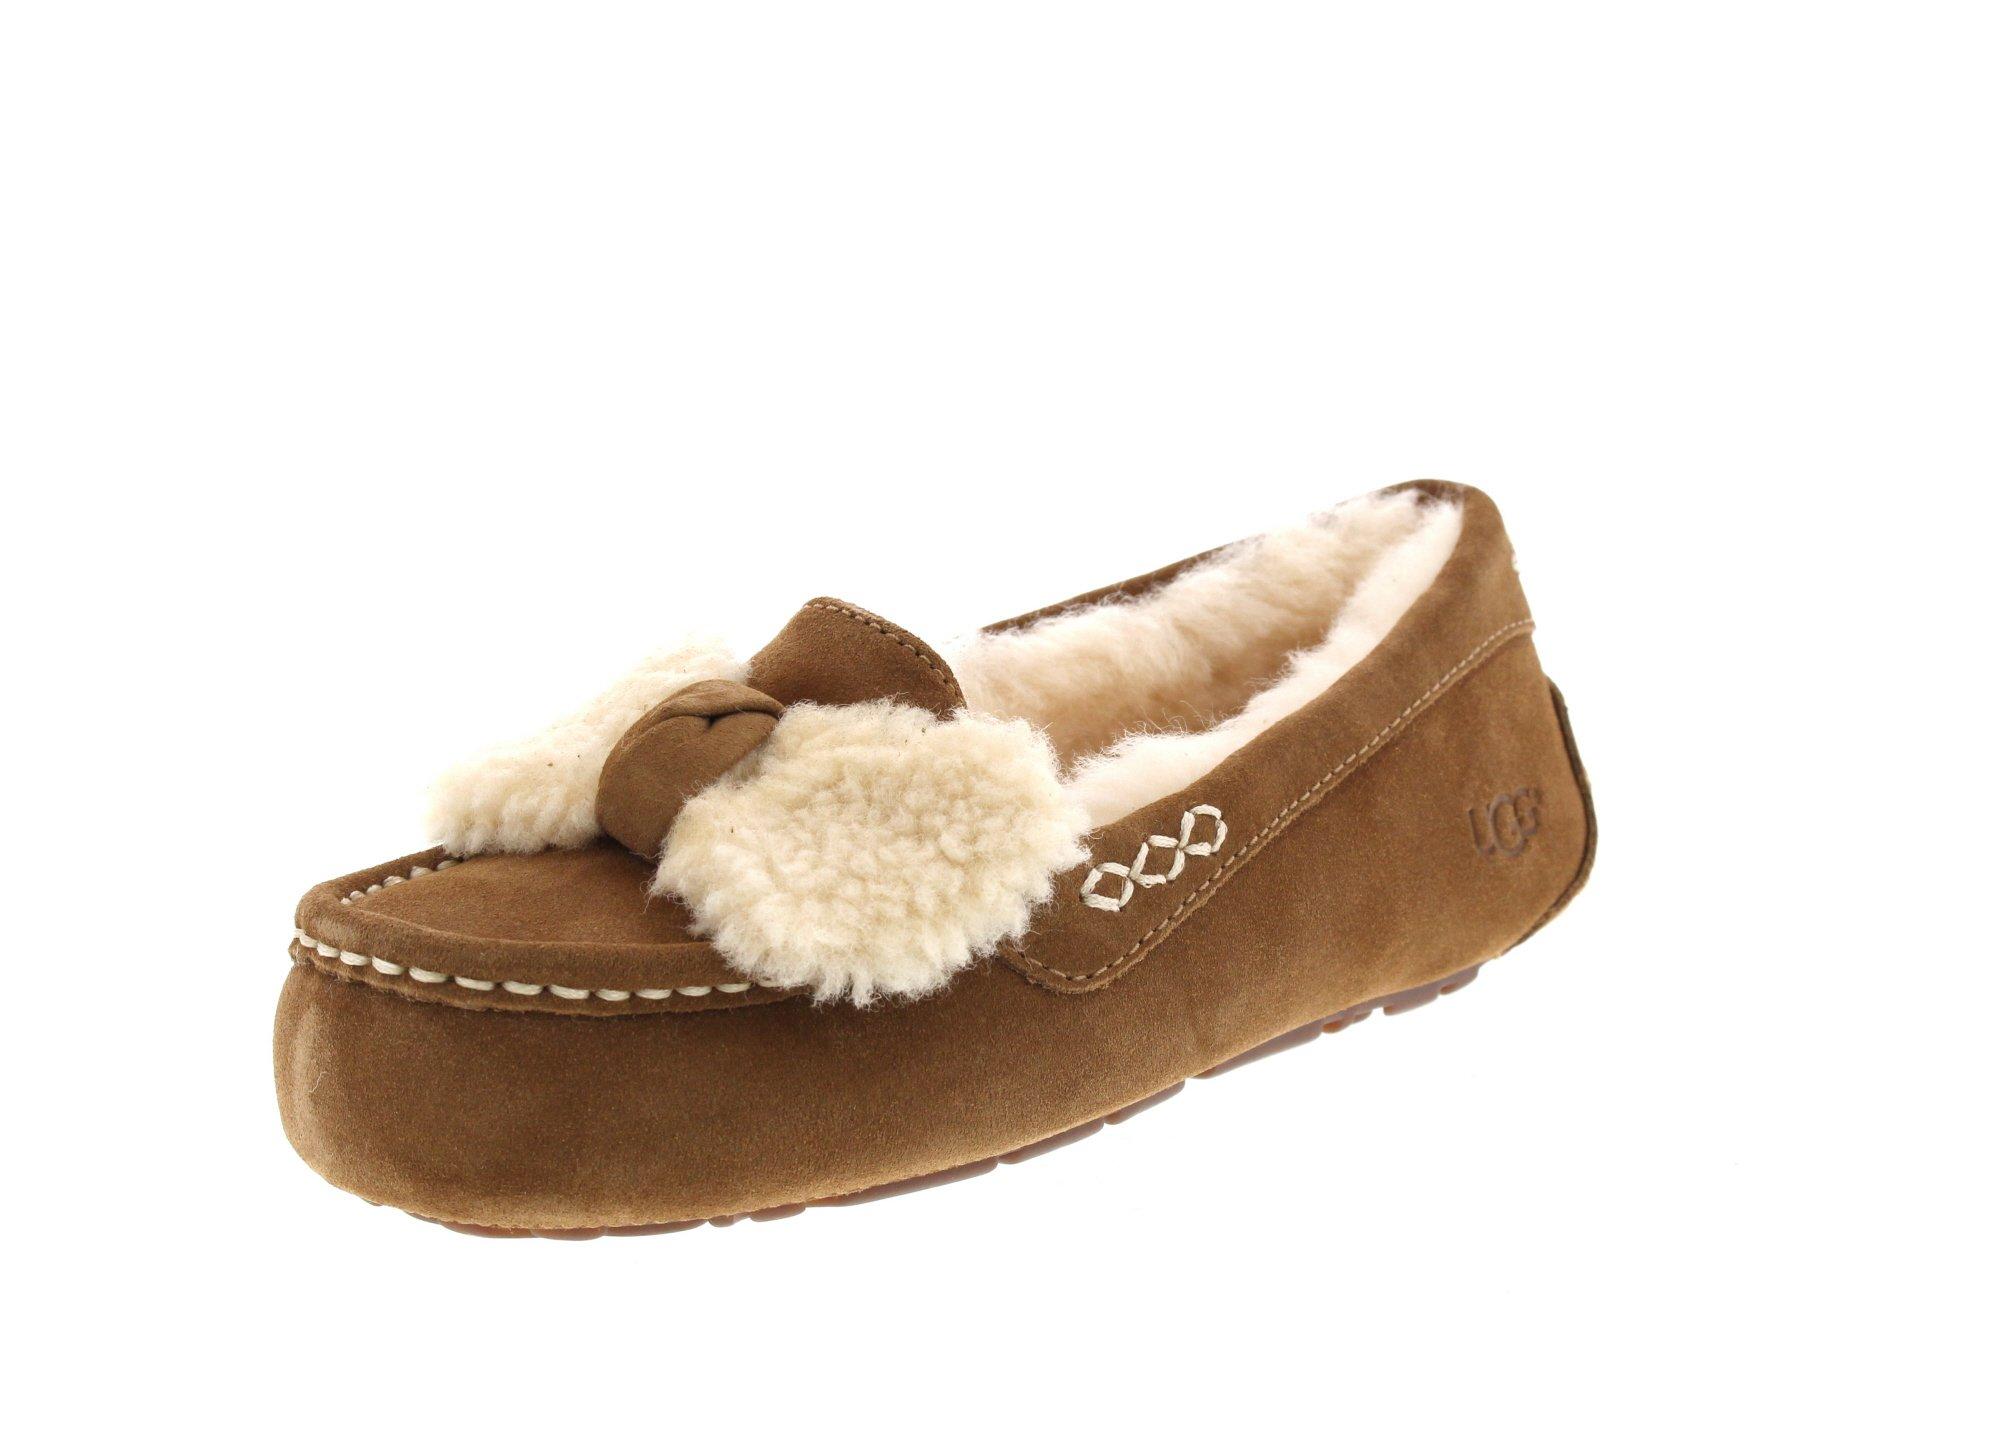 UGG Women's Ansley Fur Bow Slipper Chestnut Size 8 B(M) US